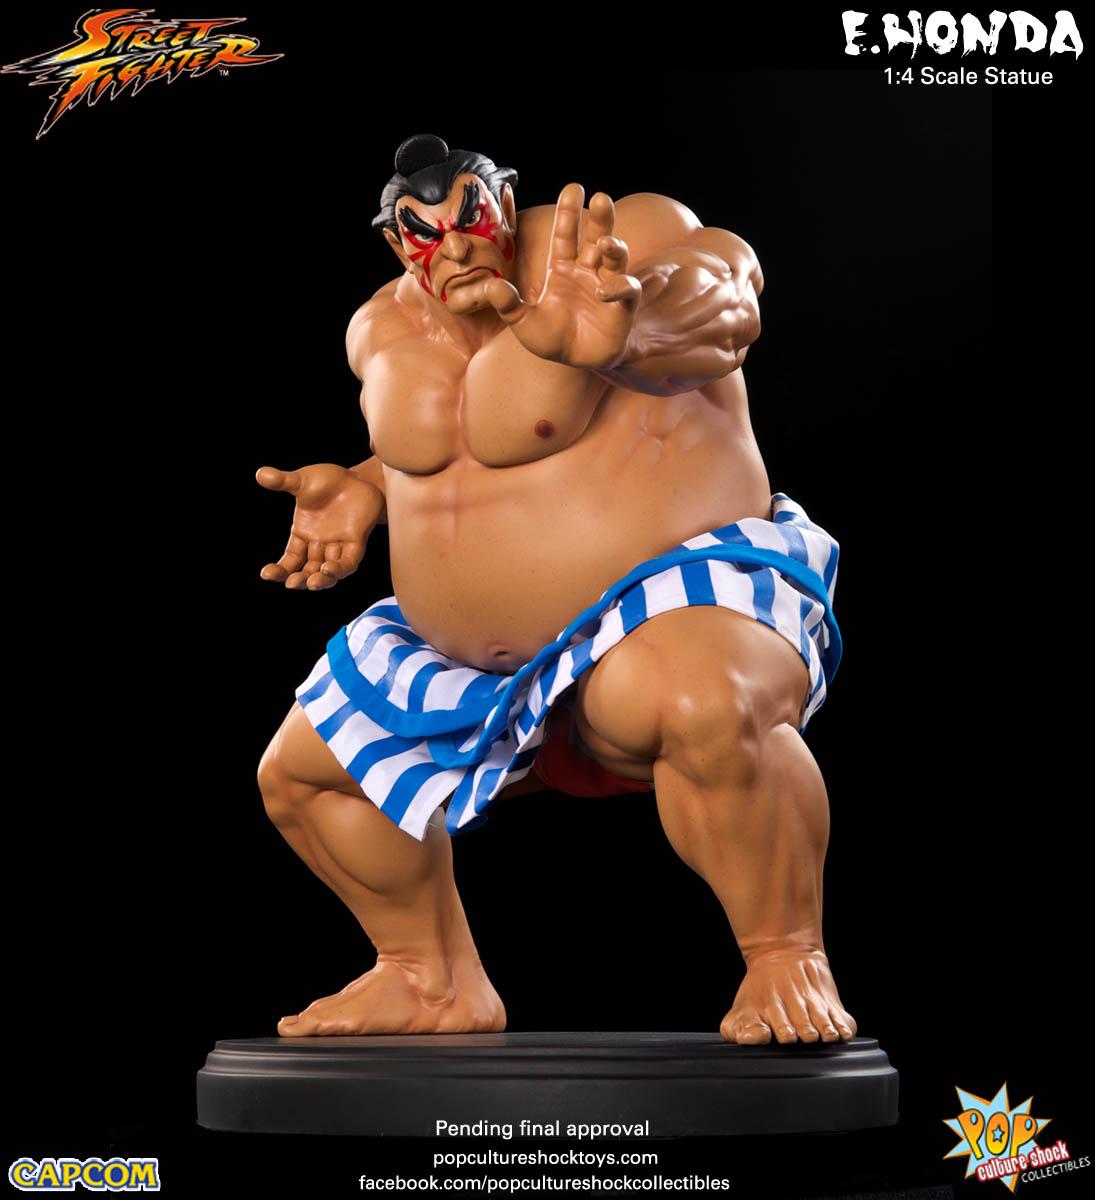 [Pop Culture Shock] Street Fighter: E. Honda 1/4 Statue - Página 3 Street-Fighter-E.-Honda-Regular-Statue-014